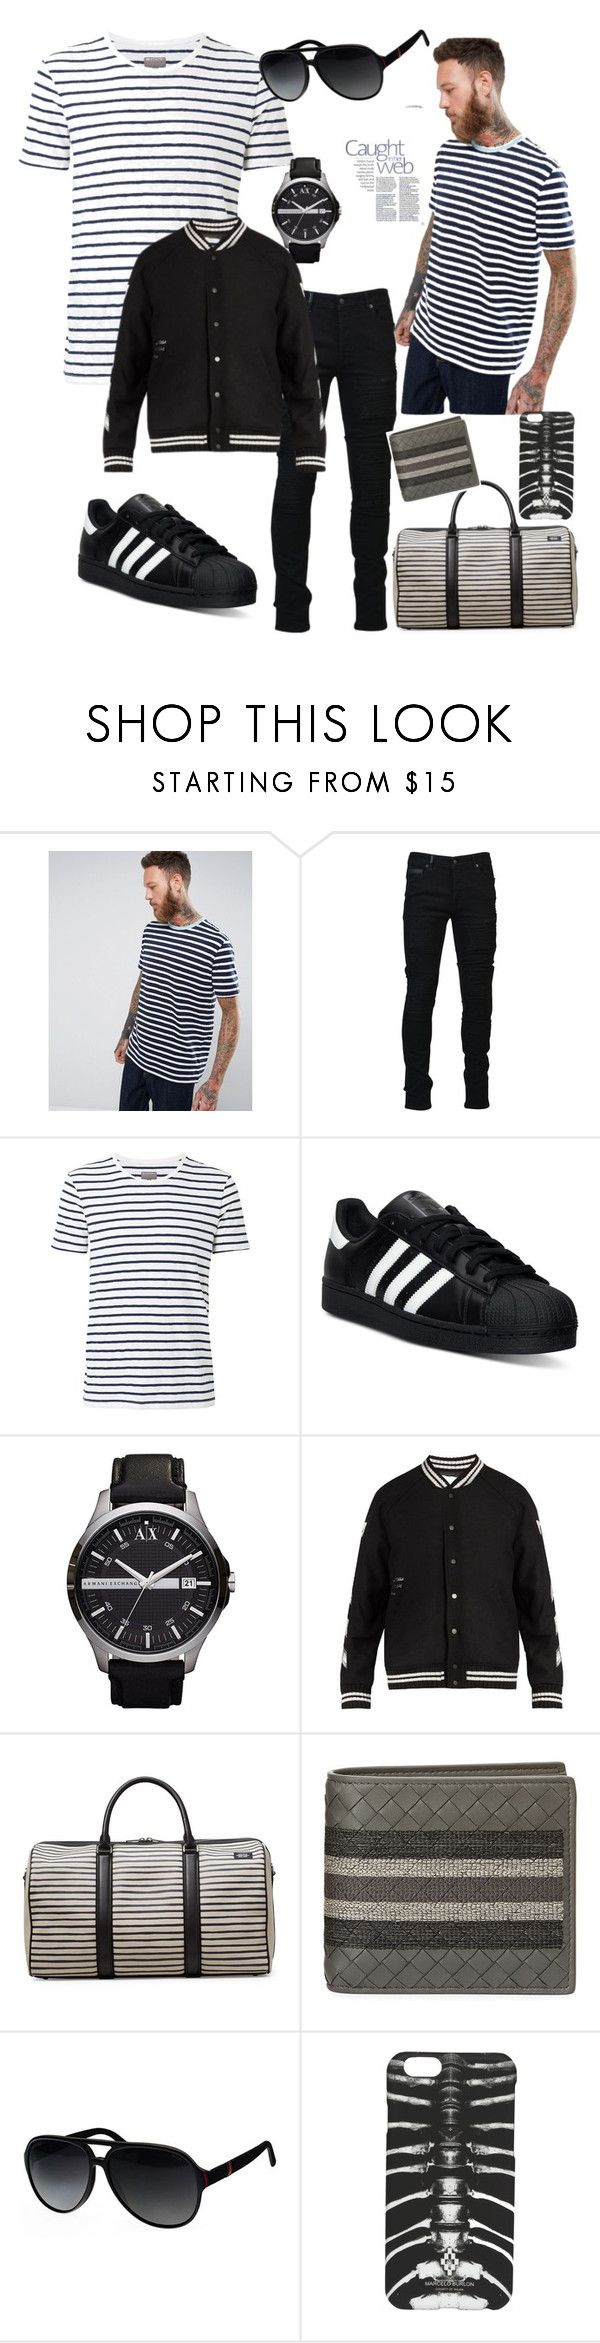 """Men's stripes"" by griselvega420 ❤ liked on Polyvore featuring ASOS, Marcelo Burlon, Witchery, adidas, Armani Exchange, Off-White, Jack Spade, Bottega Veneta, Gucci and men's fashion"